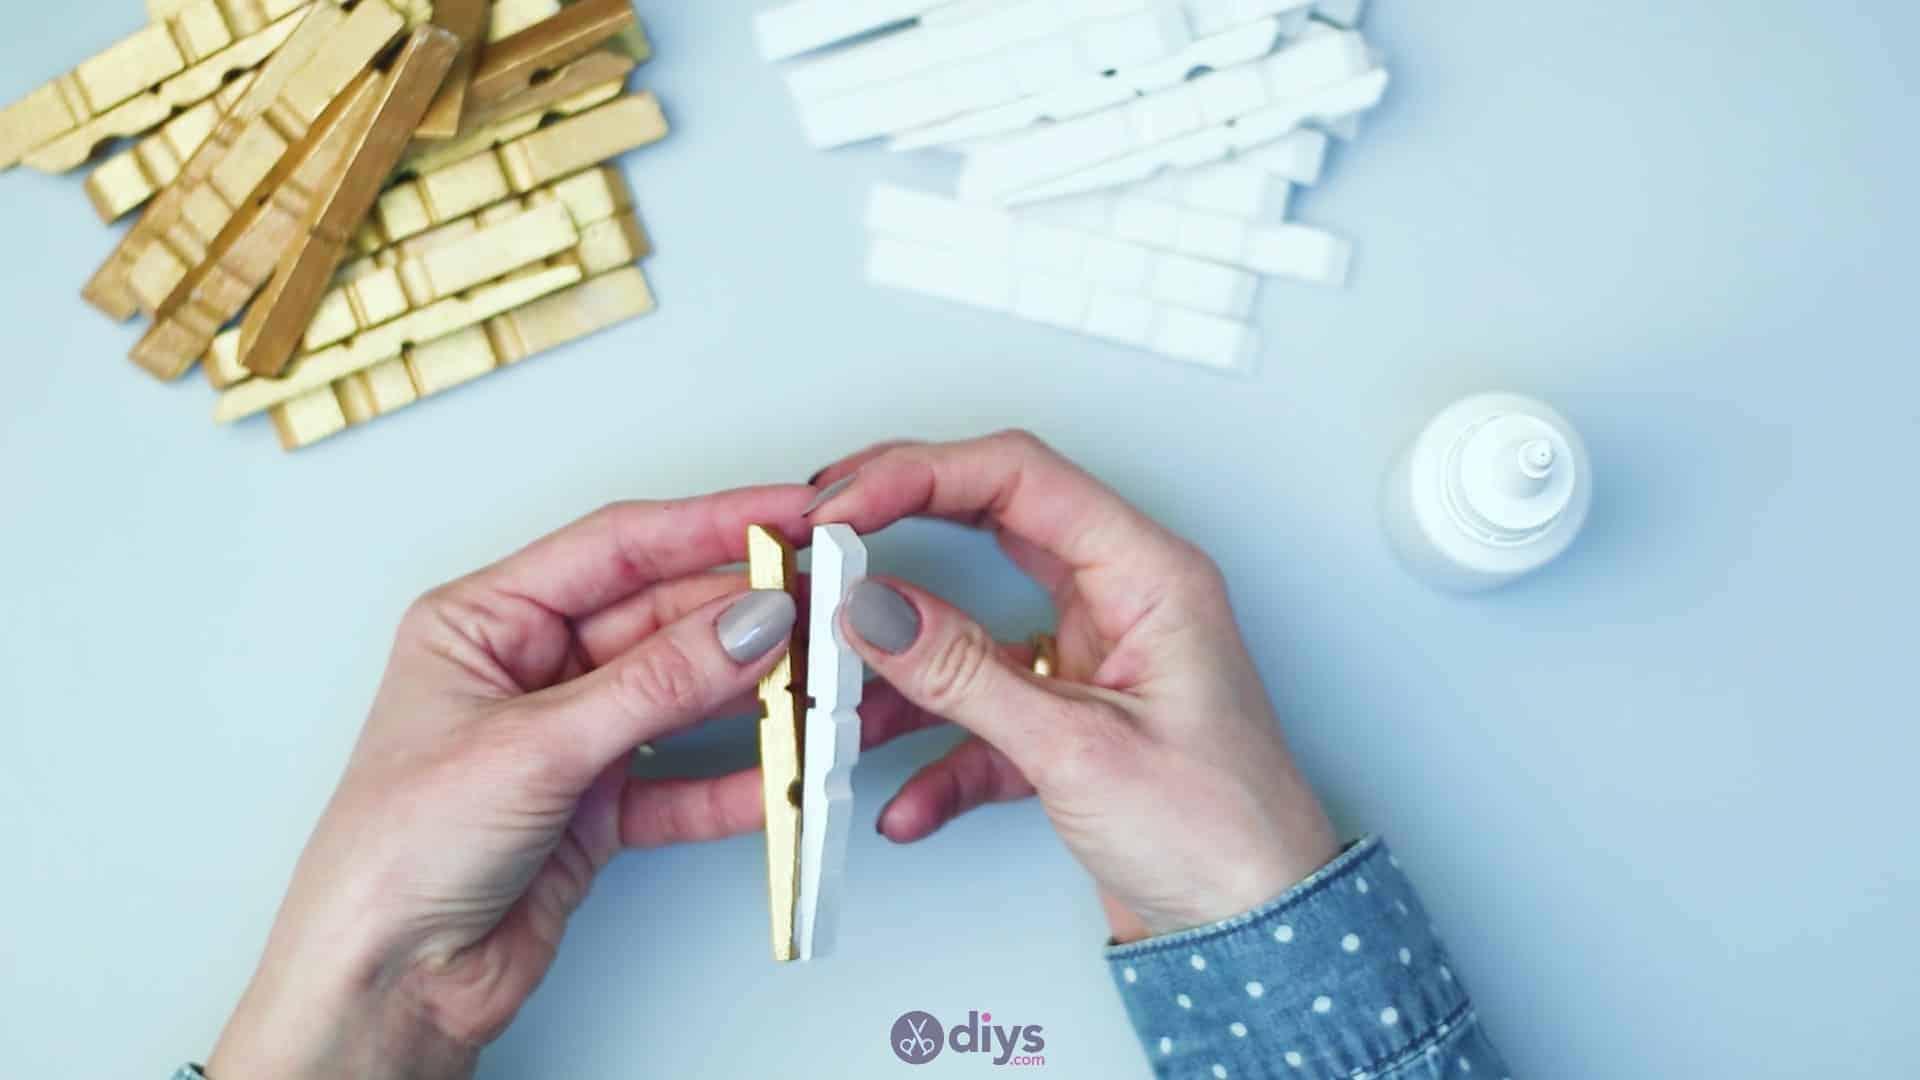 Diy clothespin art step 5a